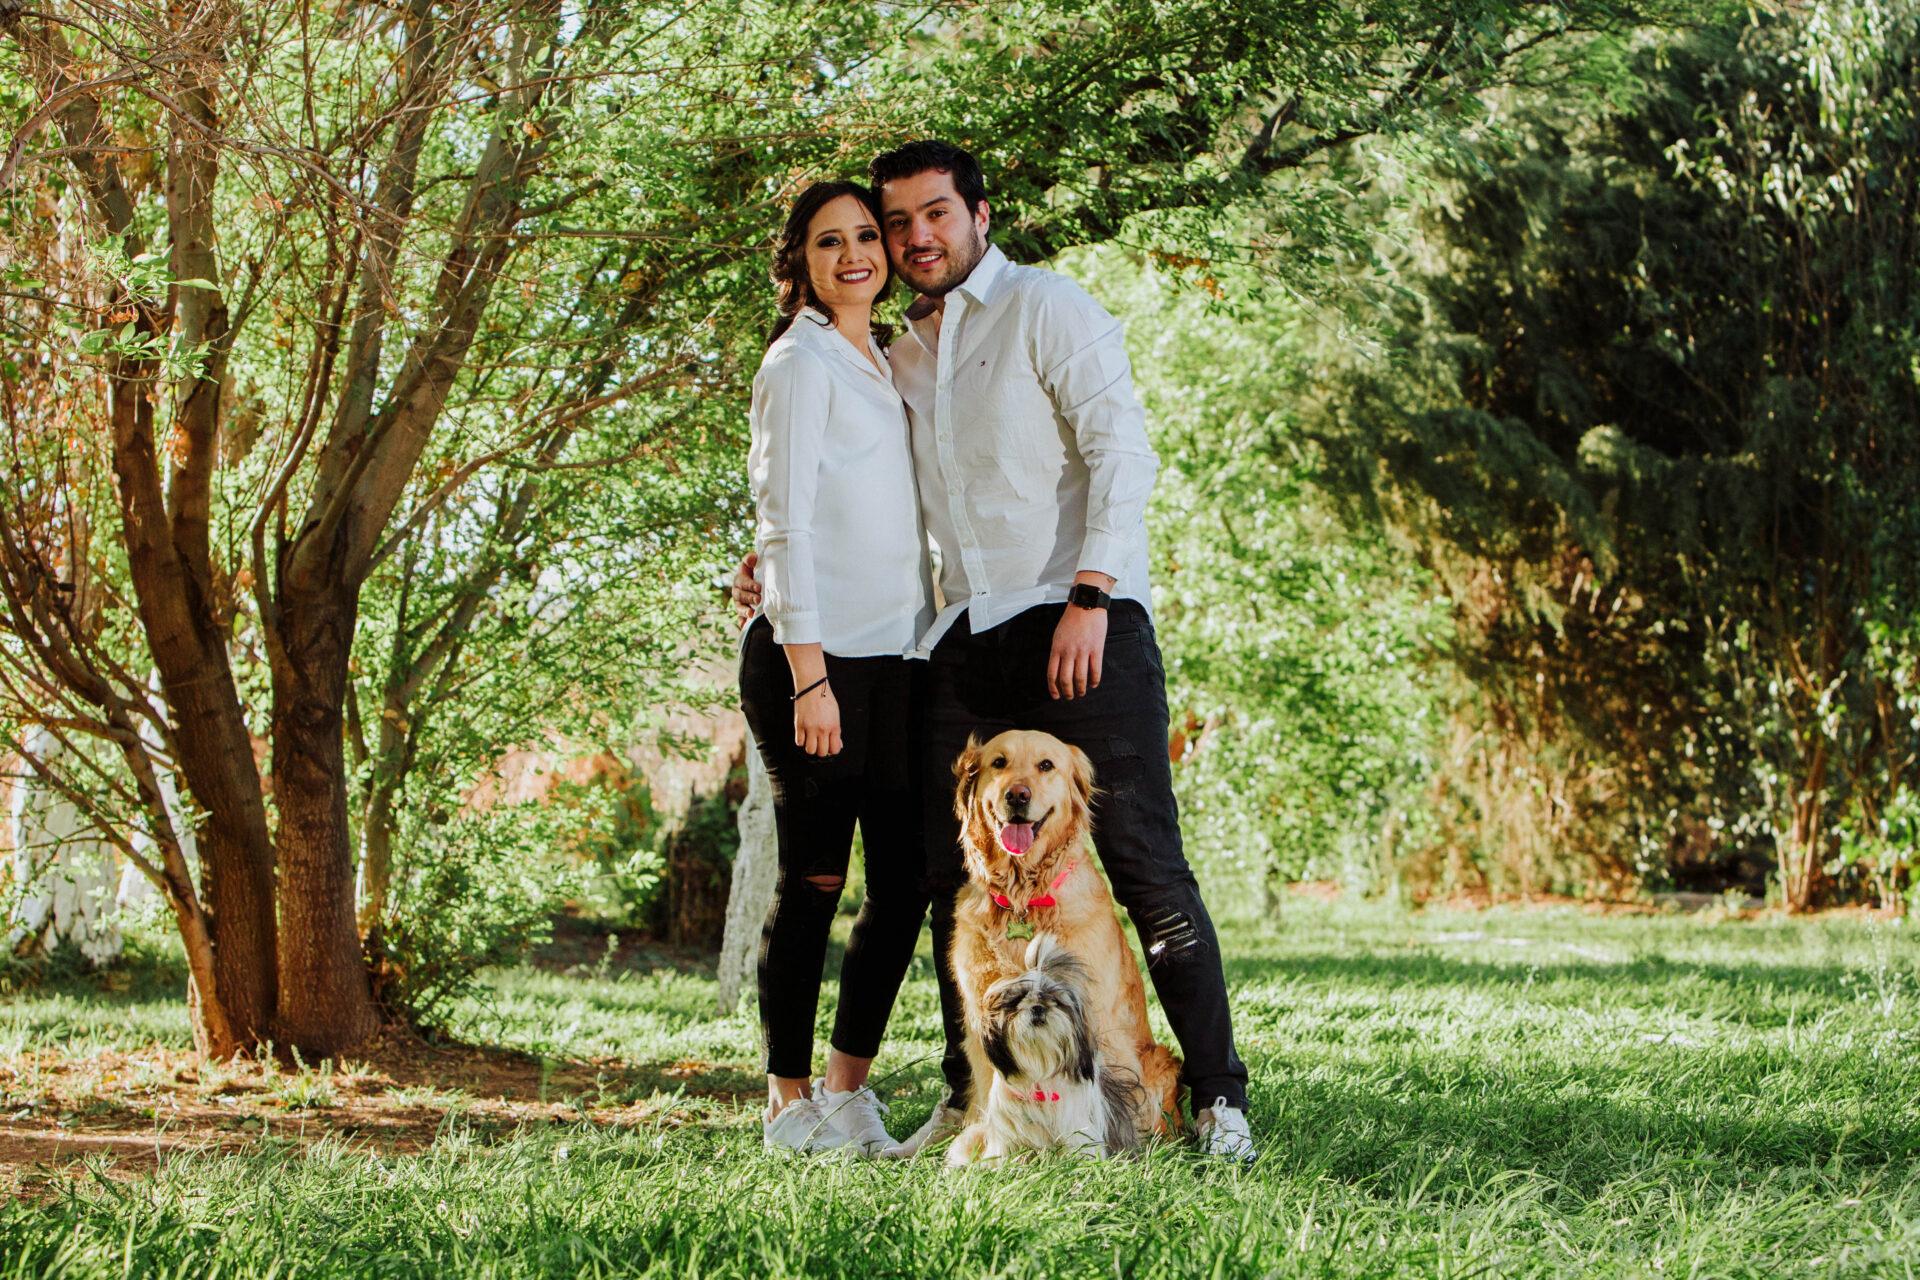 javier_noriega_fotografo_save_the_date_zacatecas_wedding_photographer14